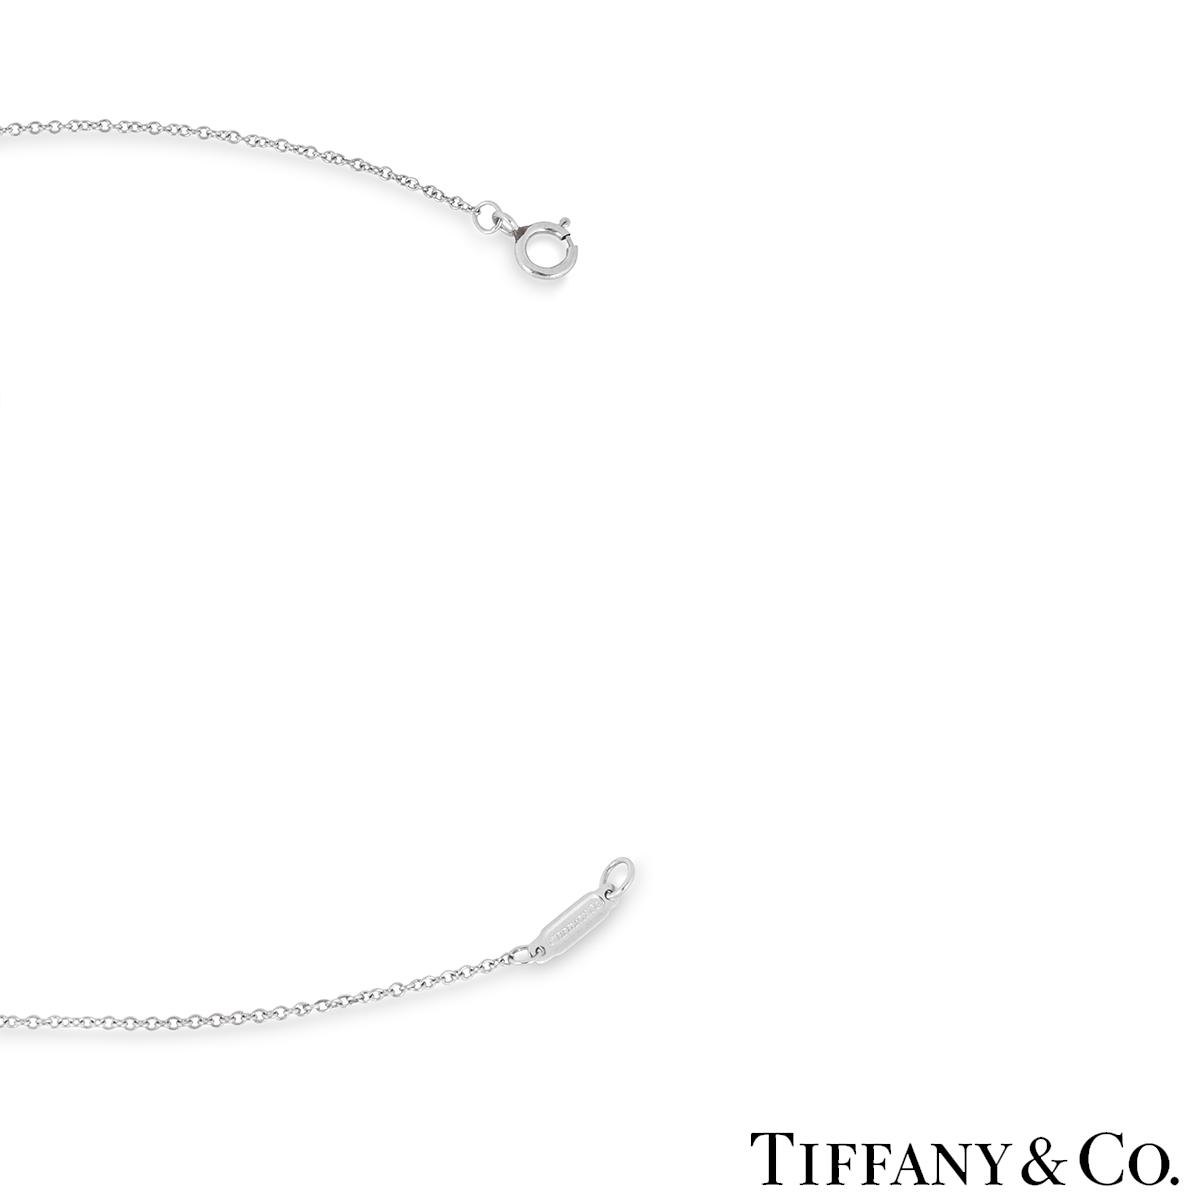 Tiffany & Co. Platinum Jazz Buckle Diamond Pendant